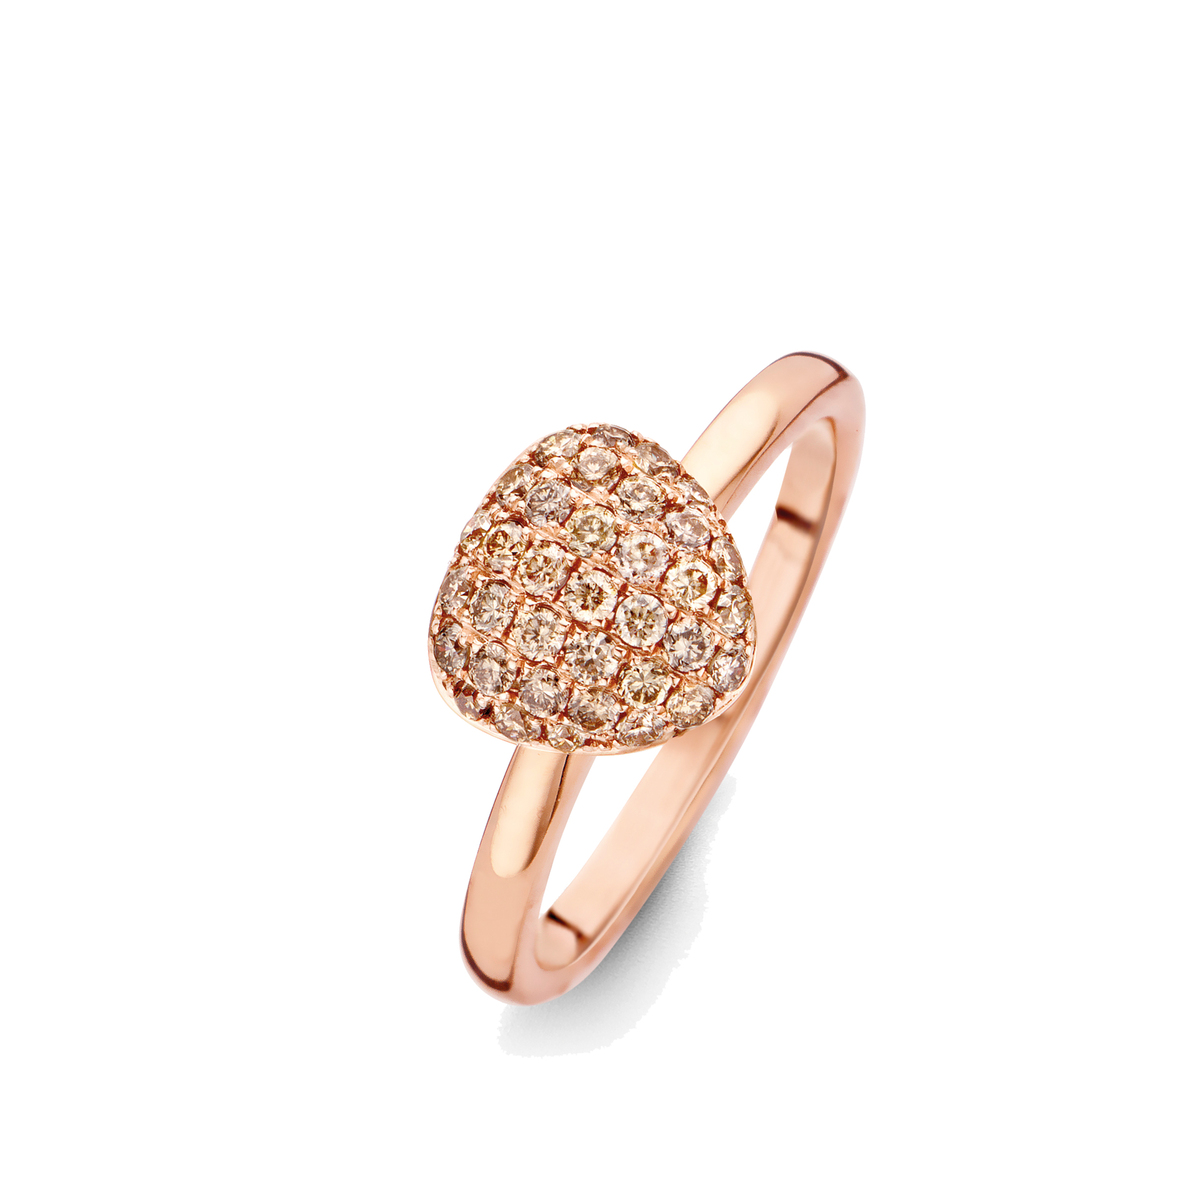 vulsini ring in rose gold